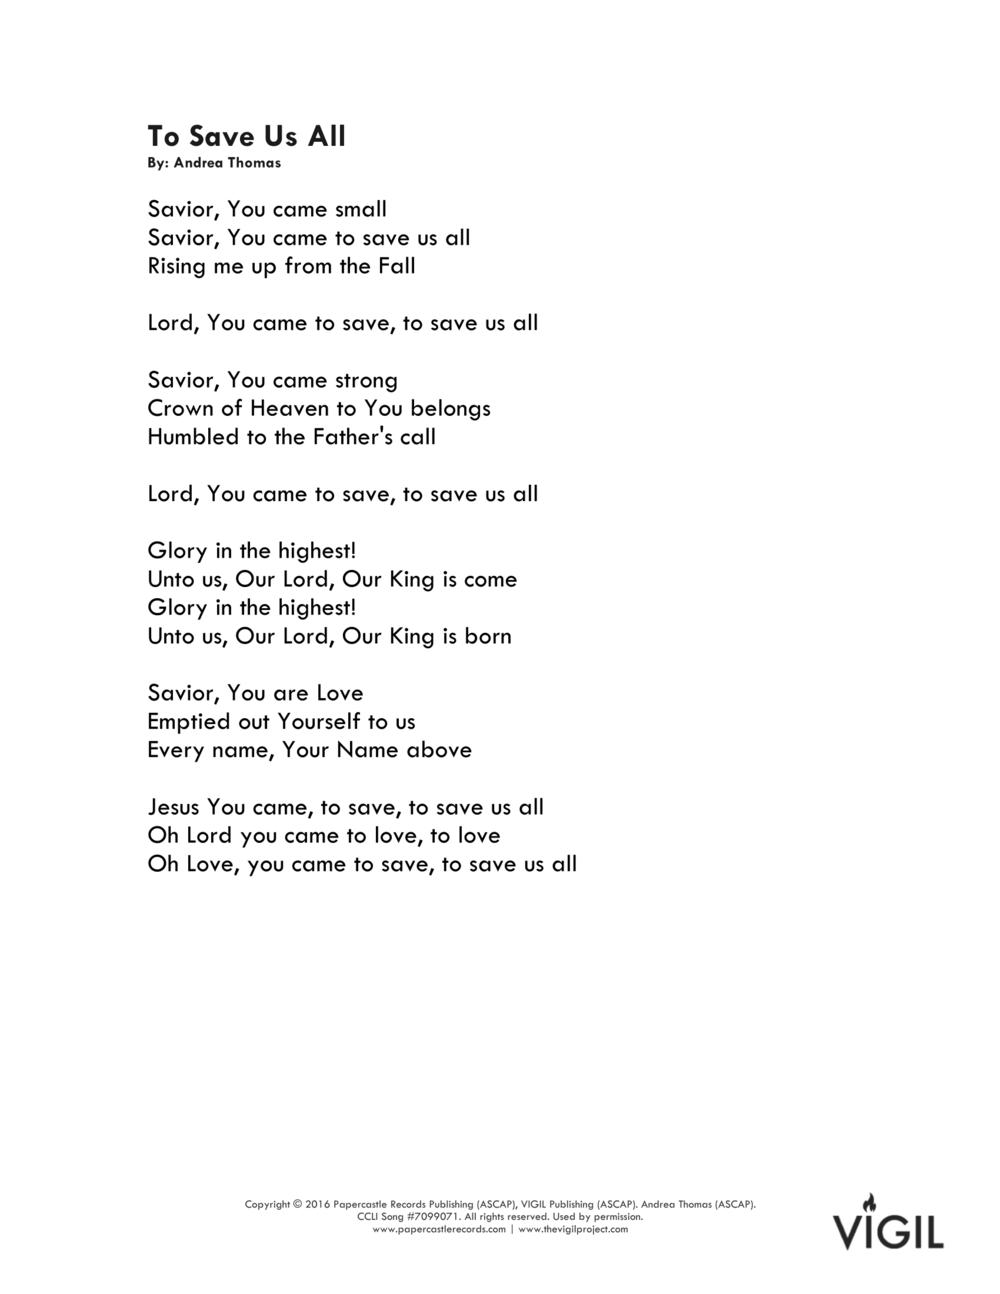 VIGIL S2 - To Save Us All (Lyrics)-1.png